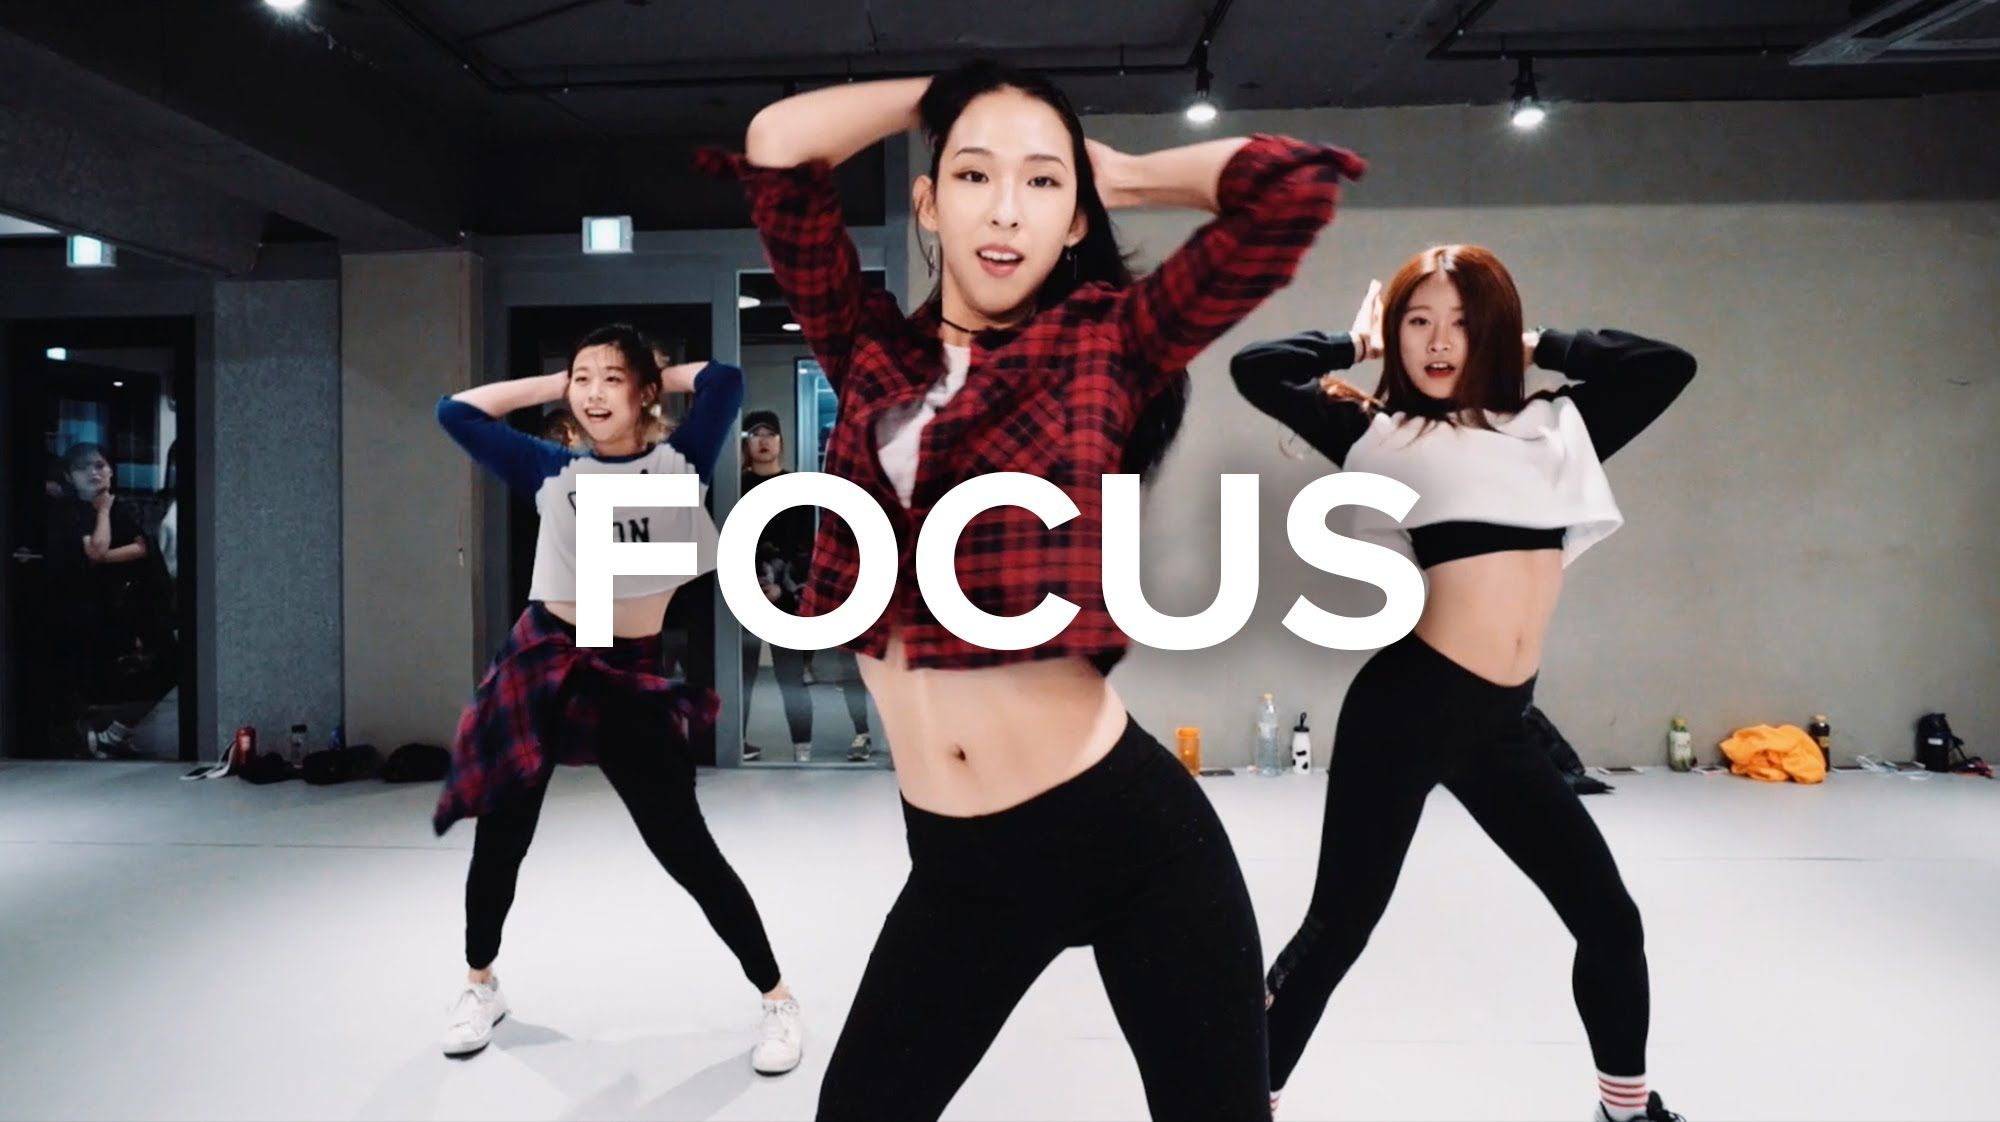 Focus - Ariana Grande / Mina Myoung Choreography in 2019   Dance choreography. Ariana grande. Dance apocalyptic